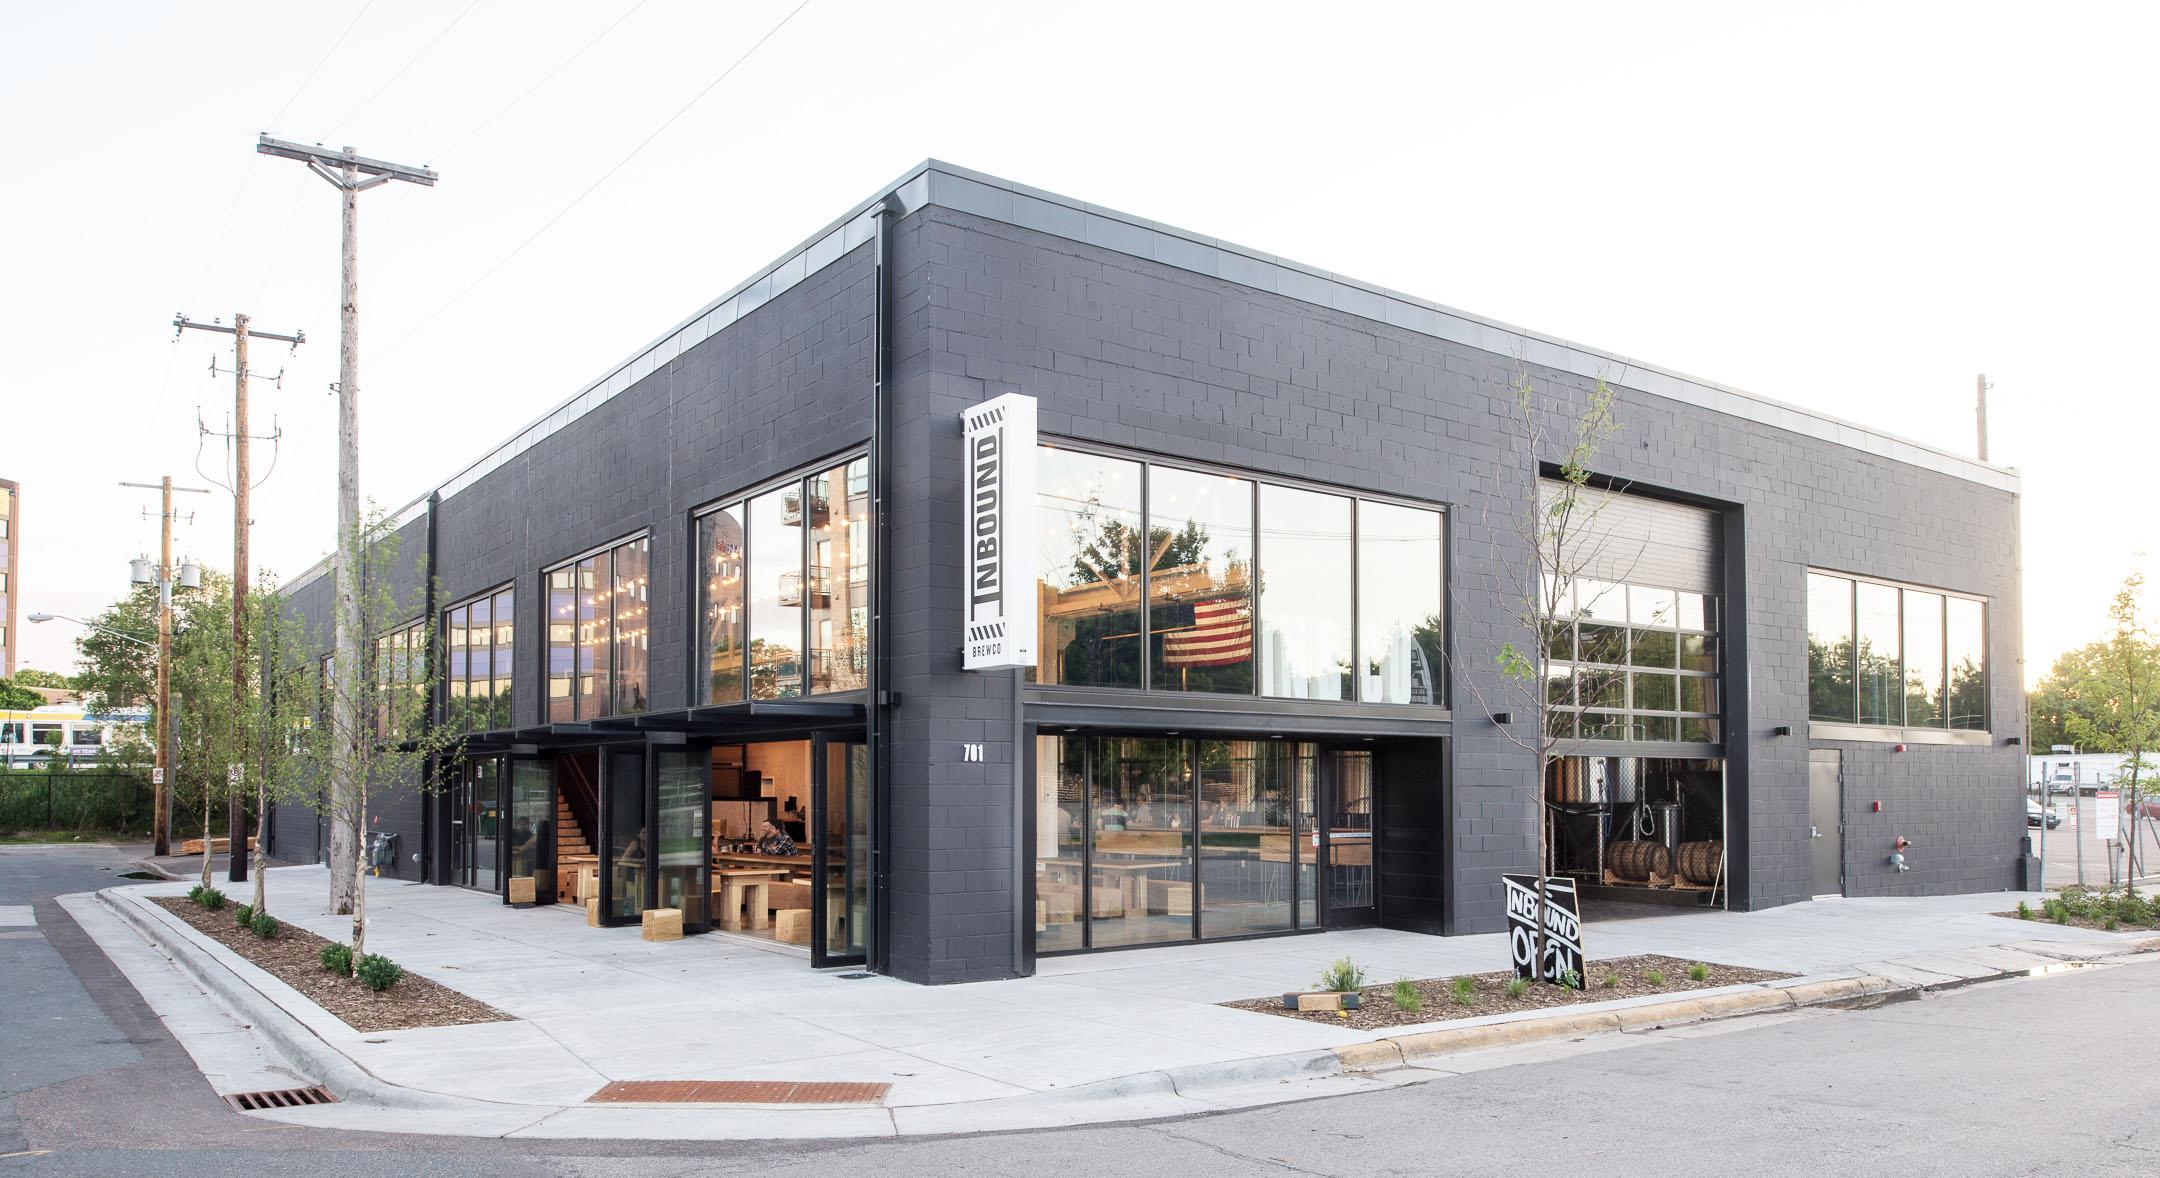 Inbound BrewCo modern renovation in Minneapolis by Christian Dean Architecture.